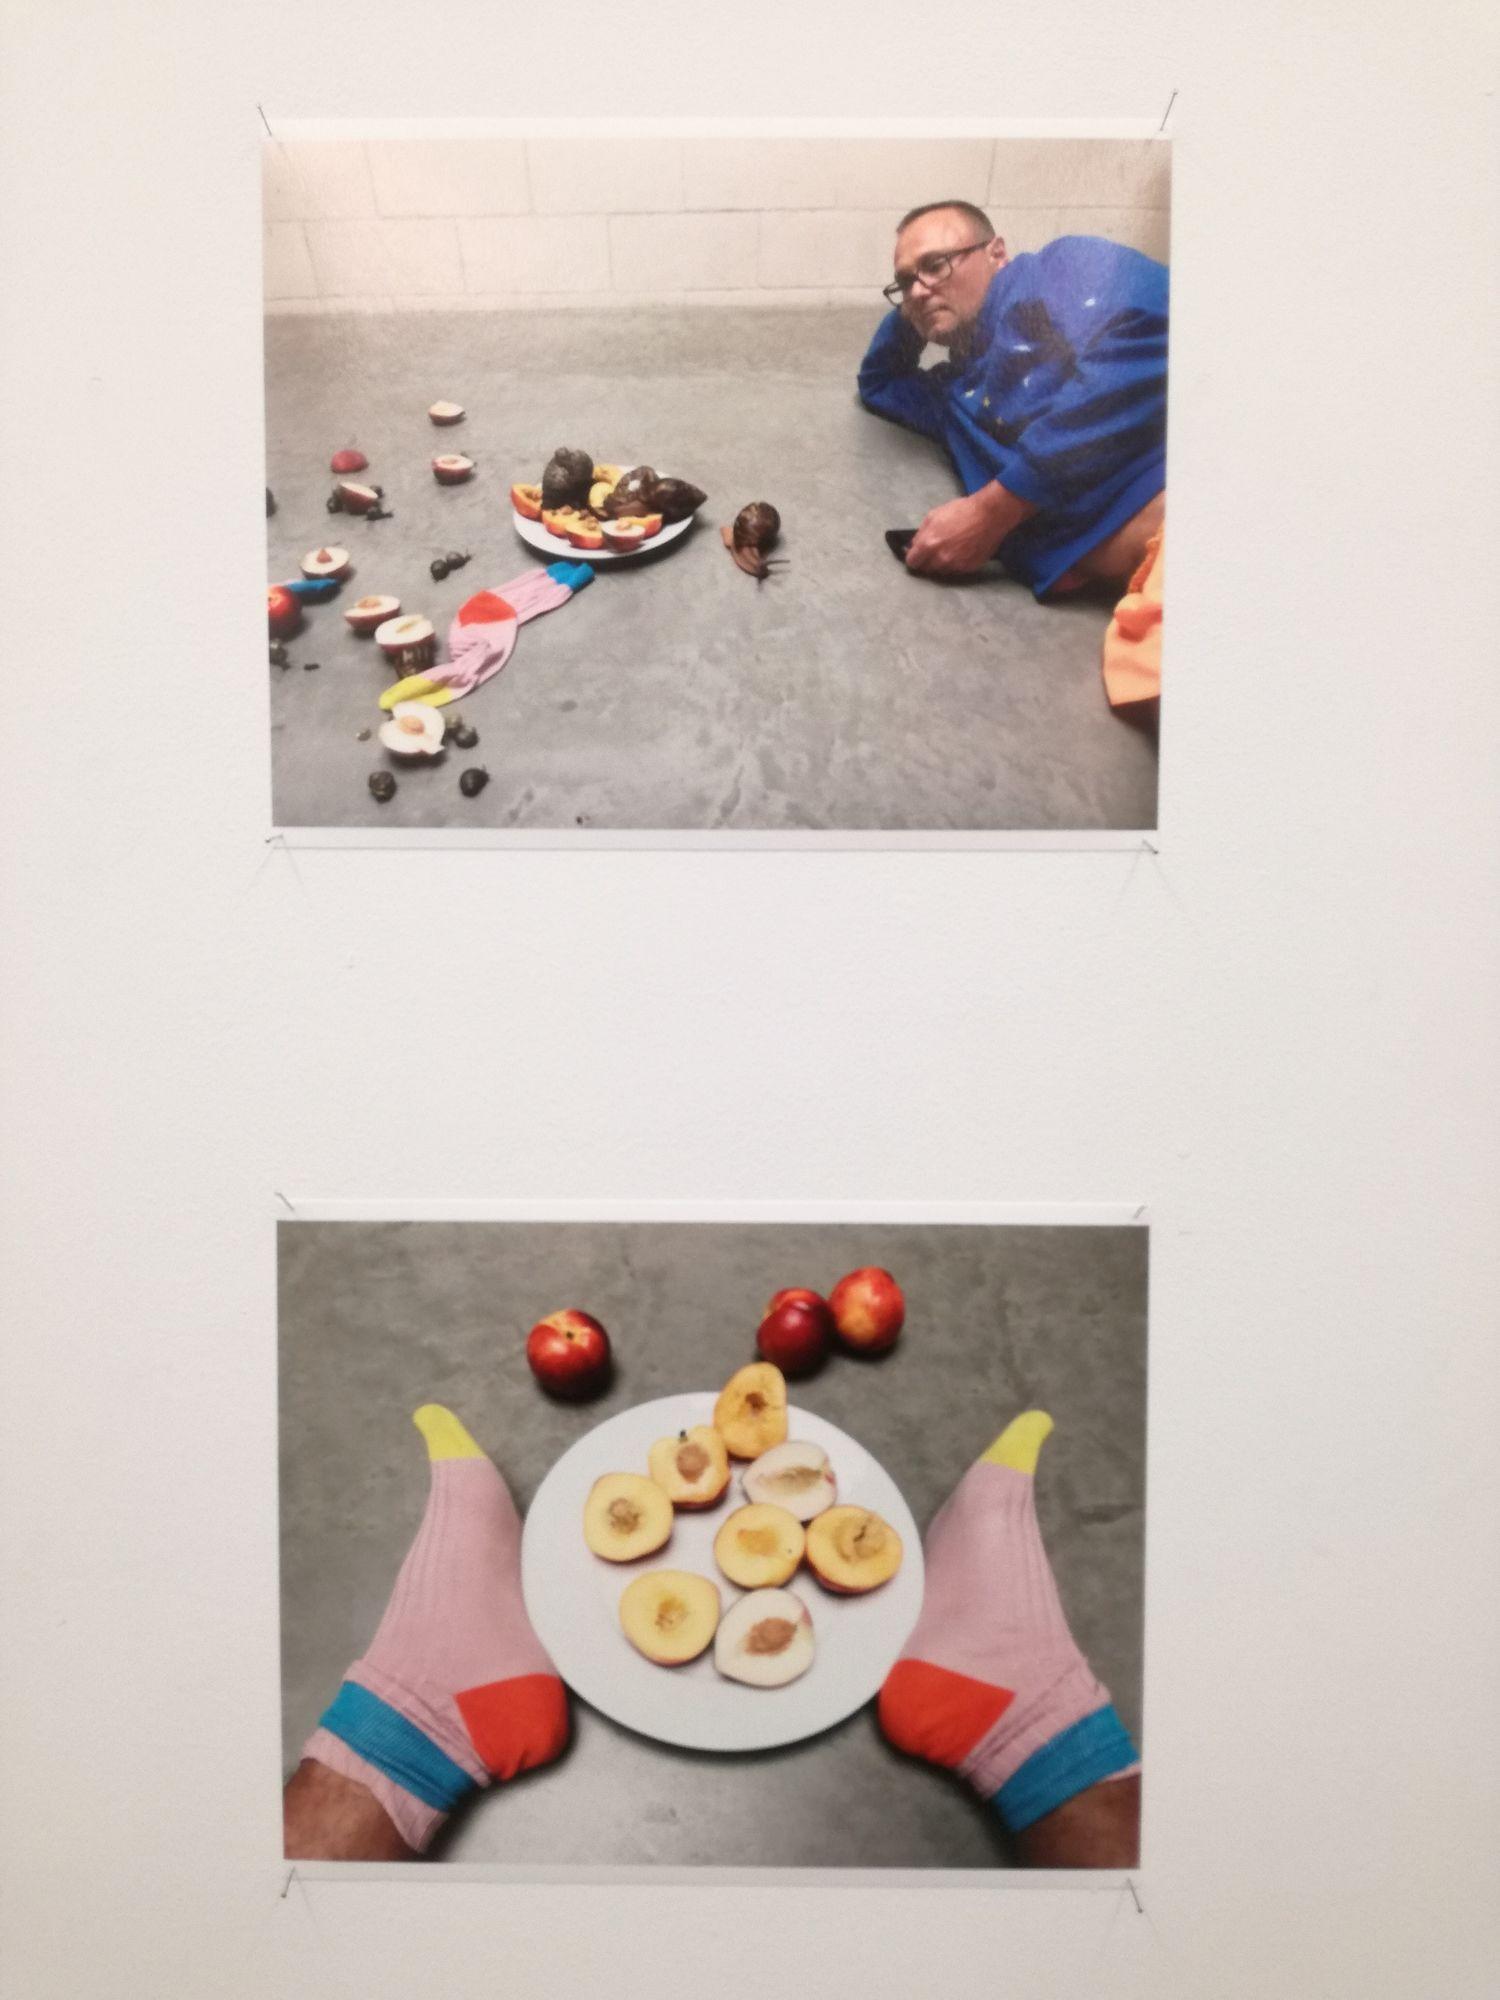 SUZANNE TARASIEVE : Juergen Teller 'Leg, snails and peaches' (13 JANUARY – 03 MARCH 2018)